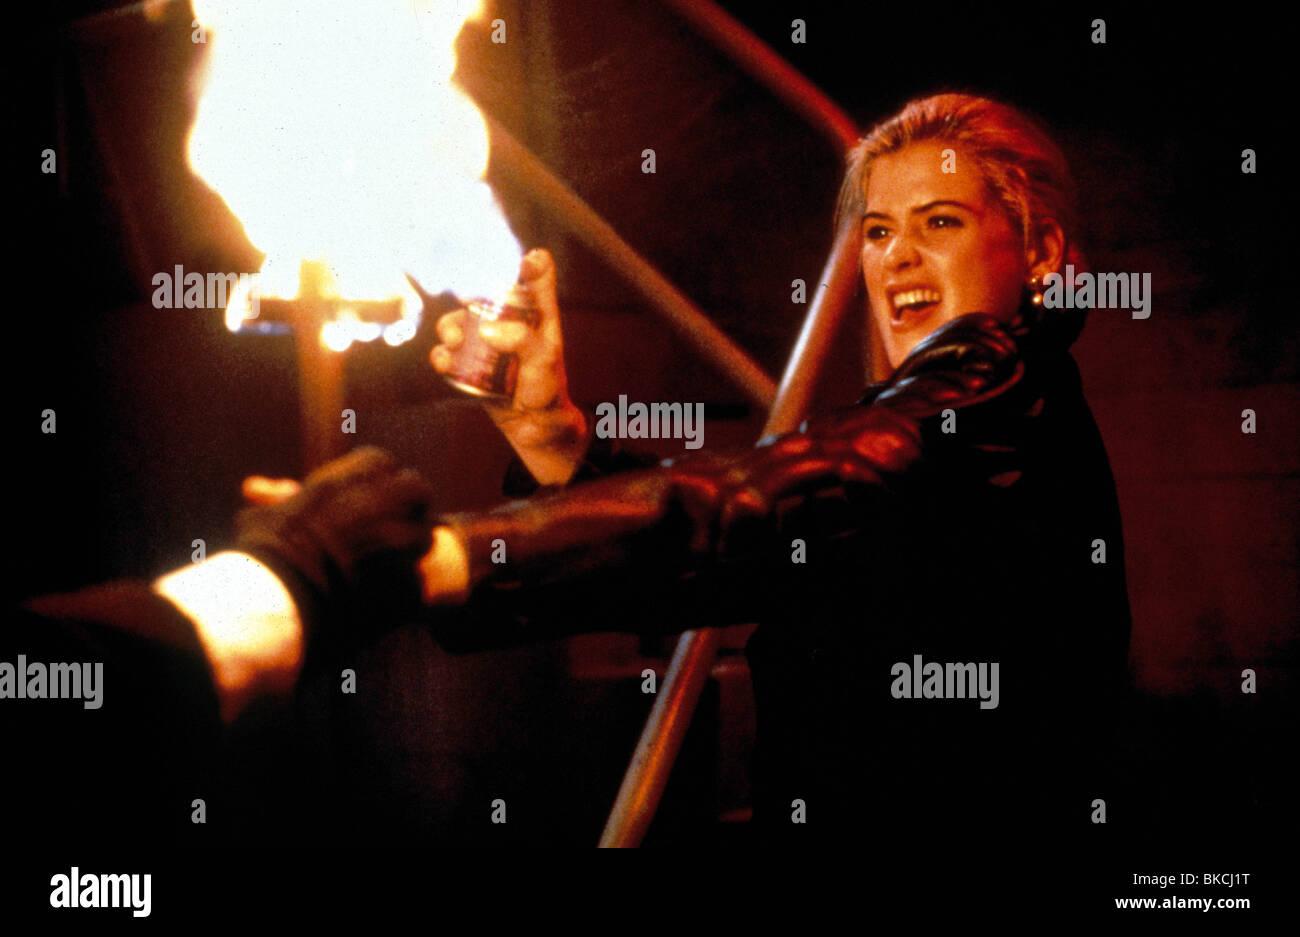 BUFFY THE VAMPIRE SLAYER (1992) KRISTY SWANSON BVS 028 - Stock Image